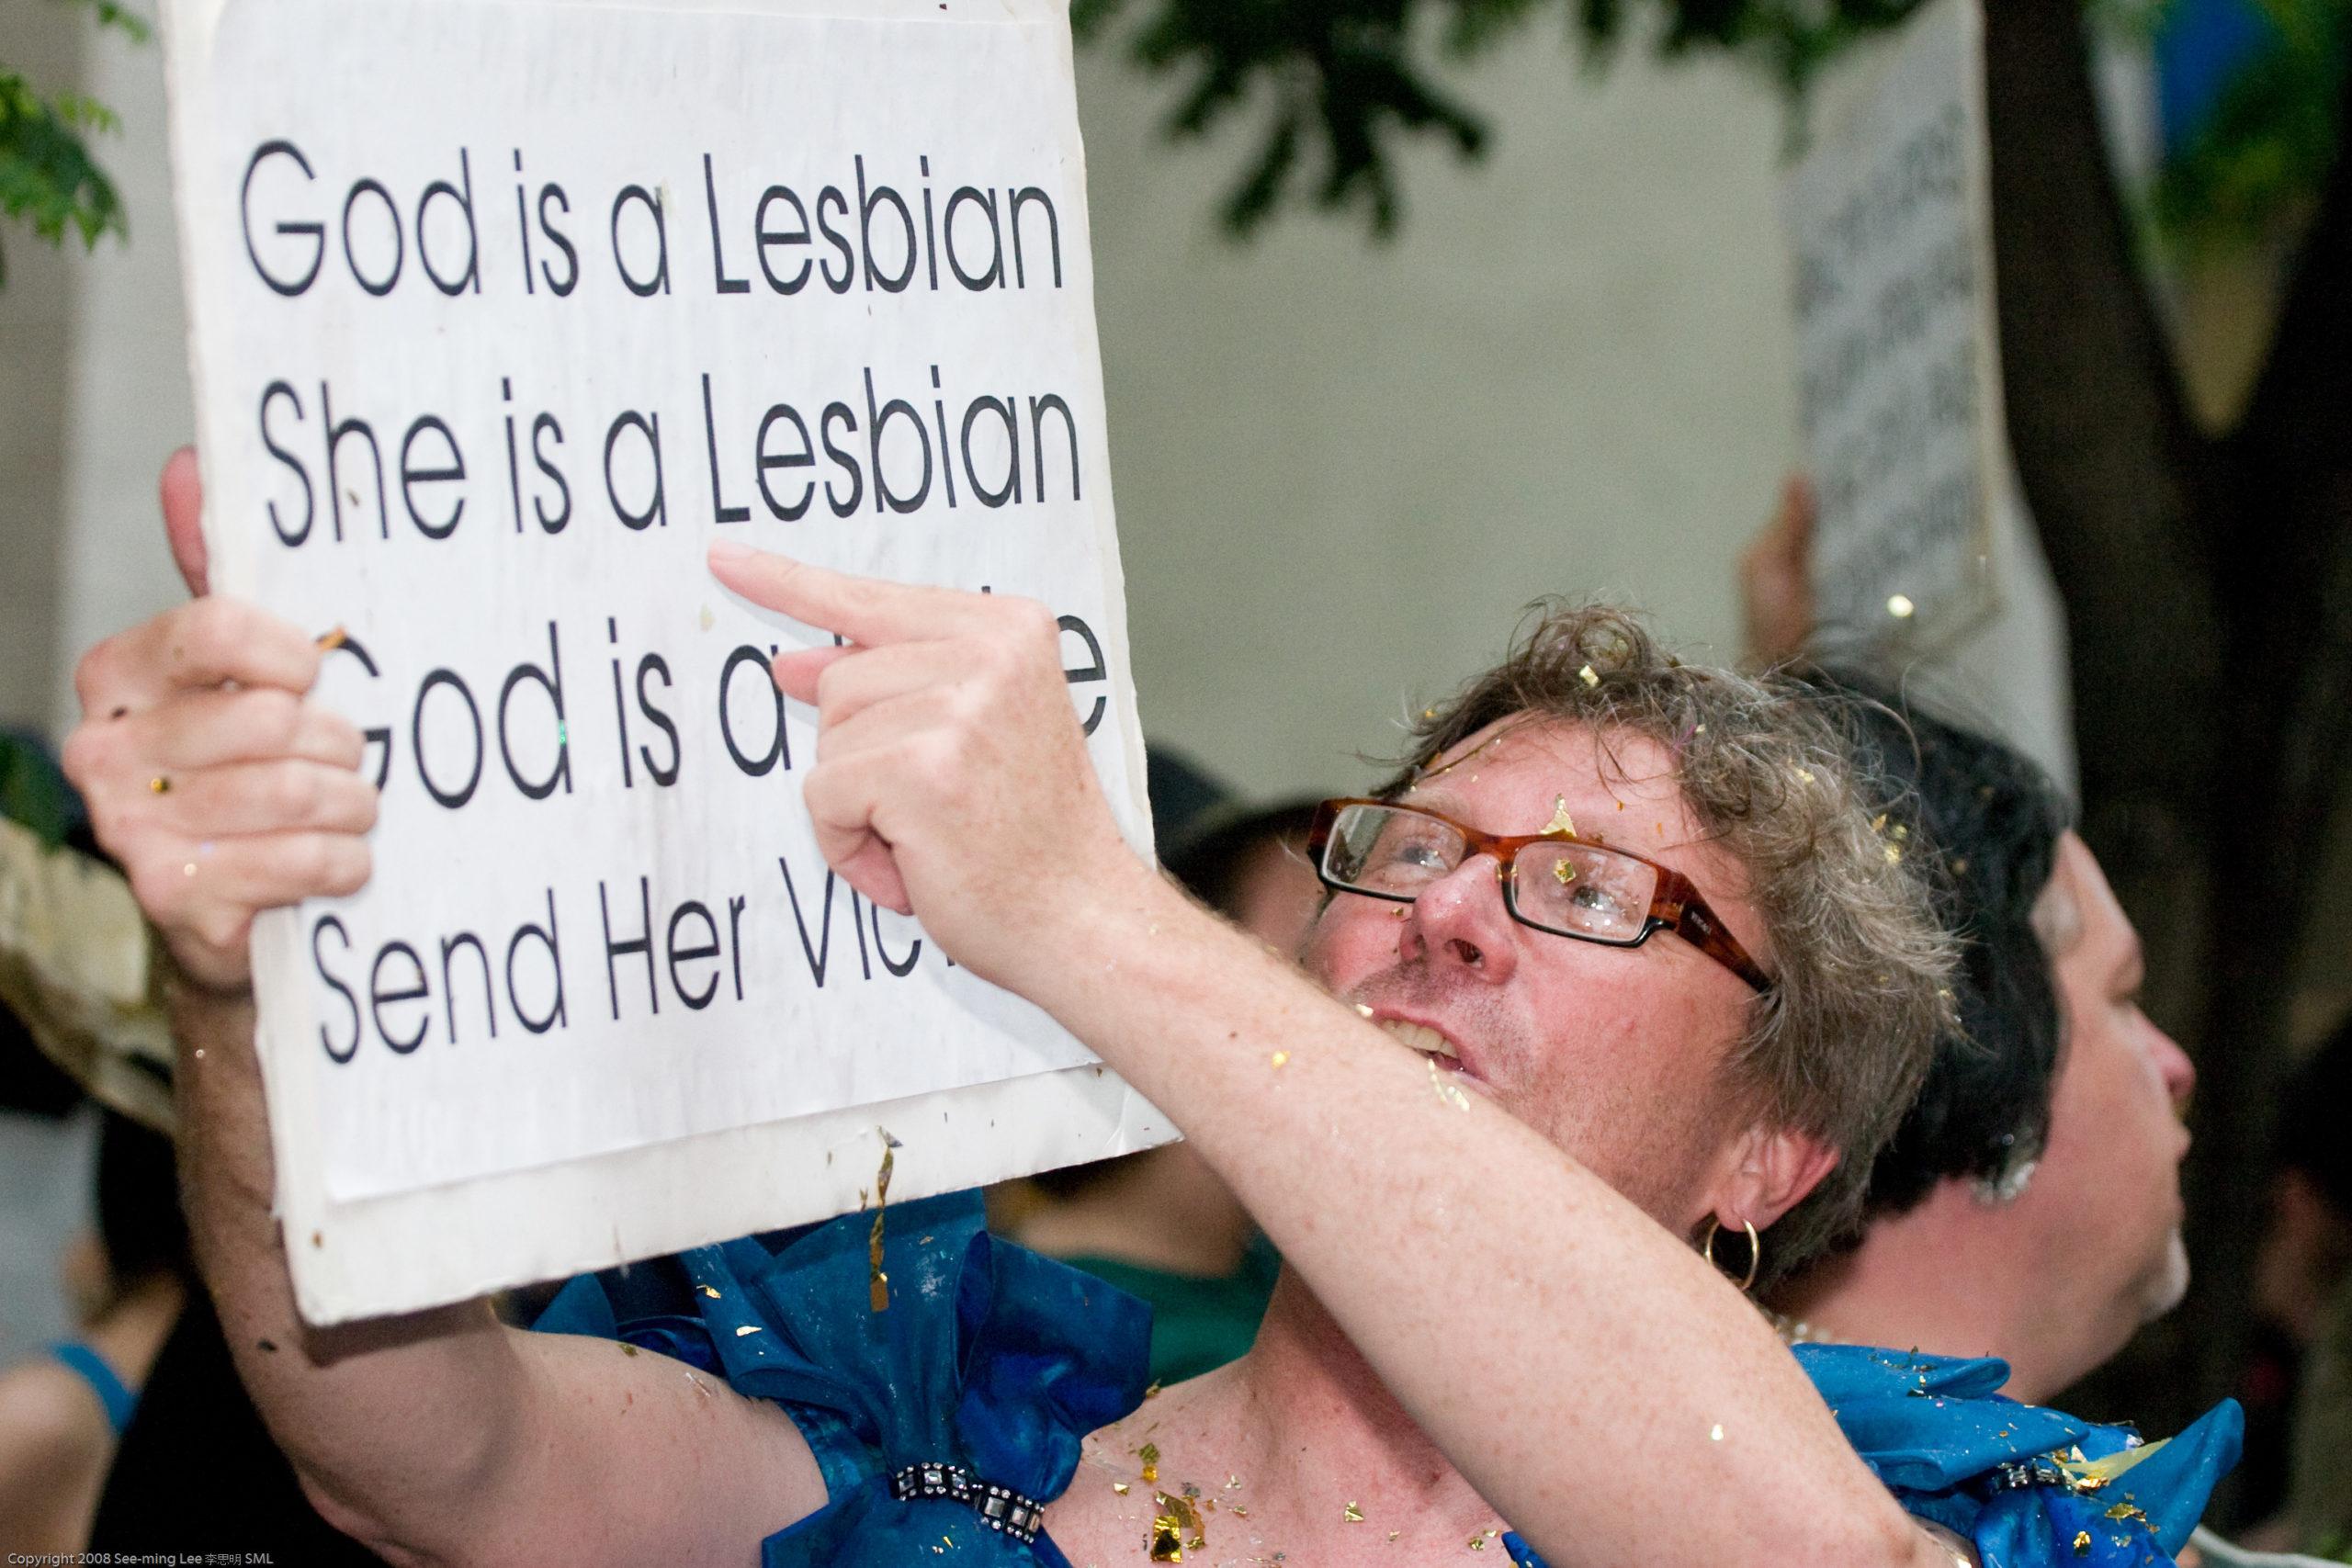 A man holding a sign